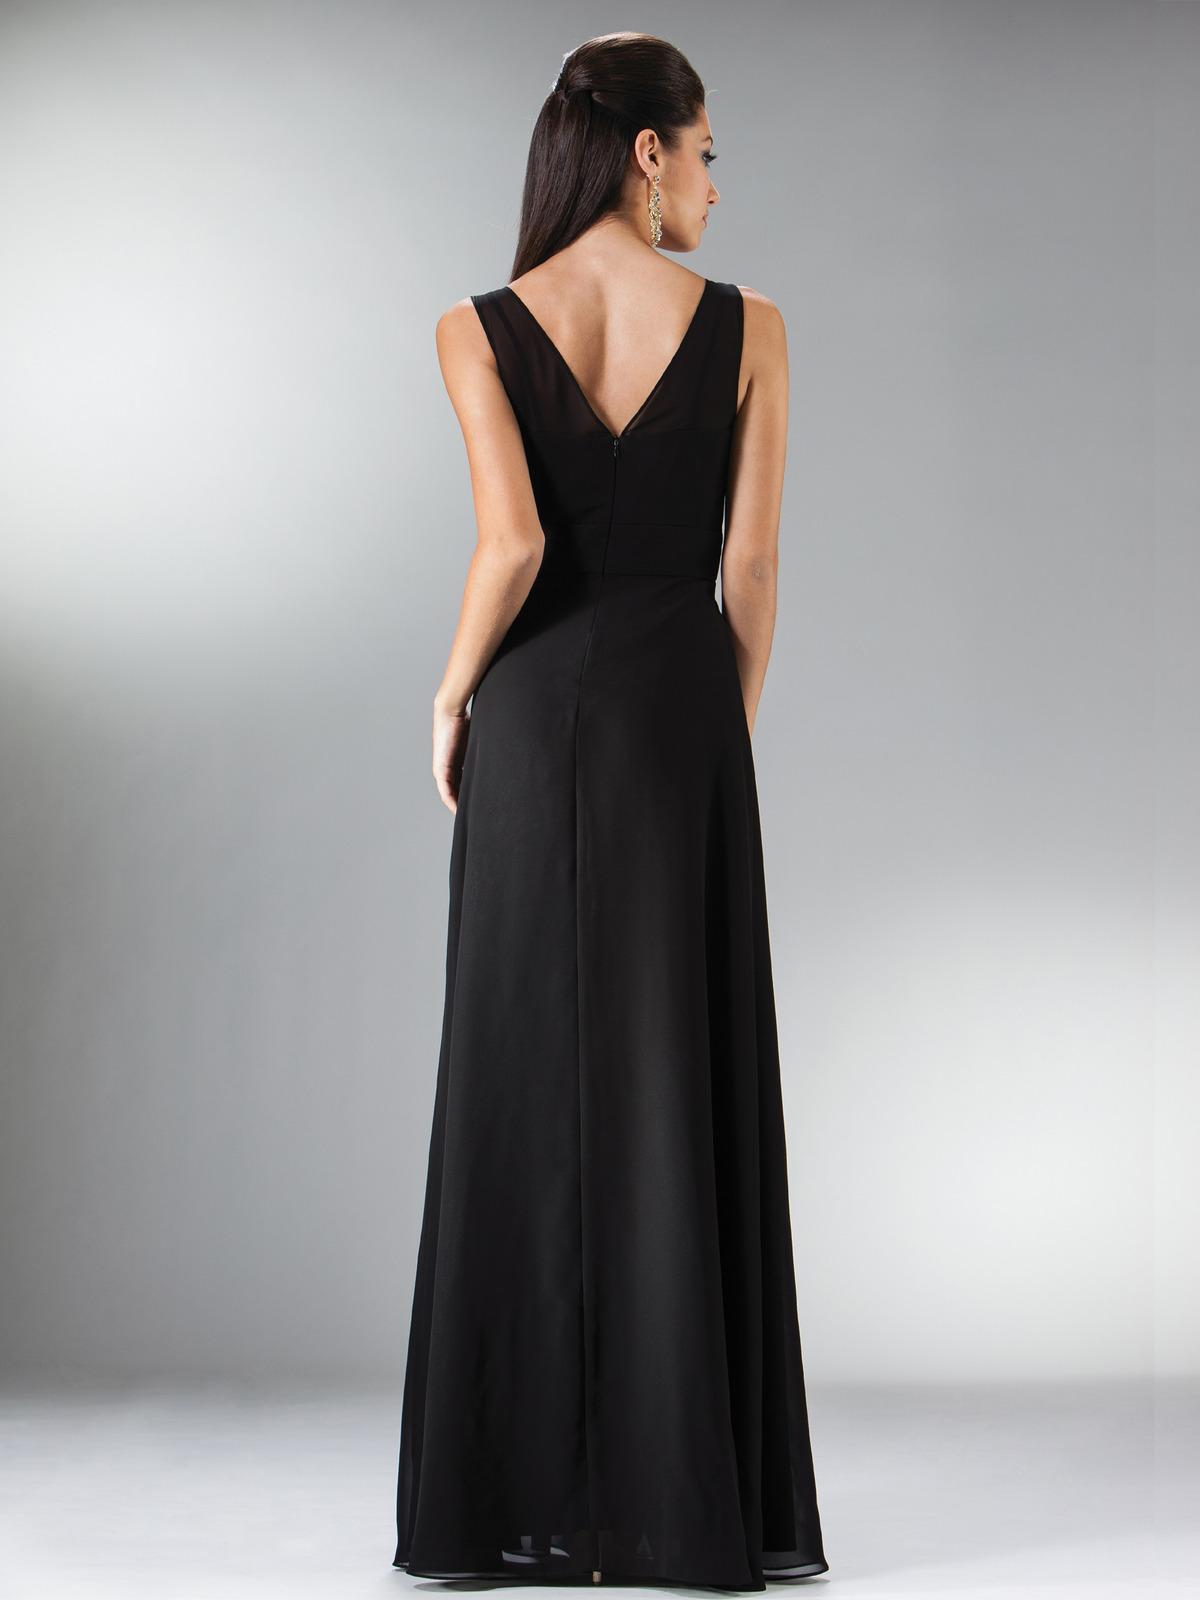 Black Tie Affair Sleeveless Evening Dress   Sung Boutique L.A.